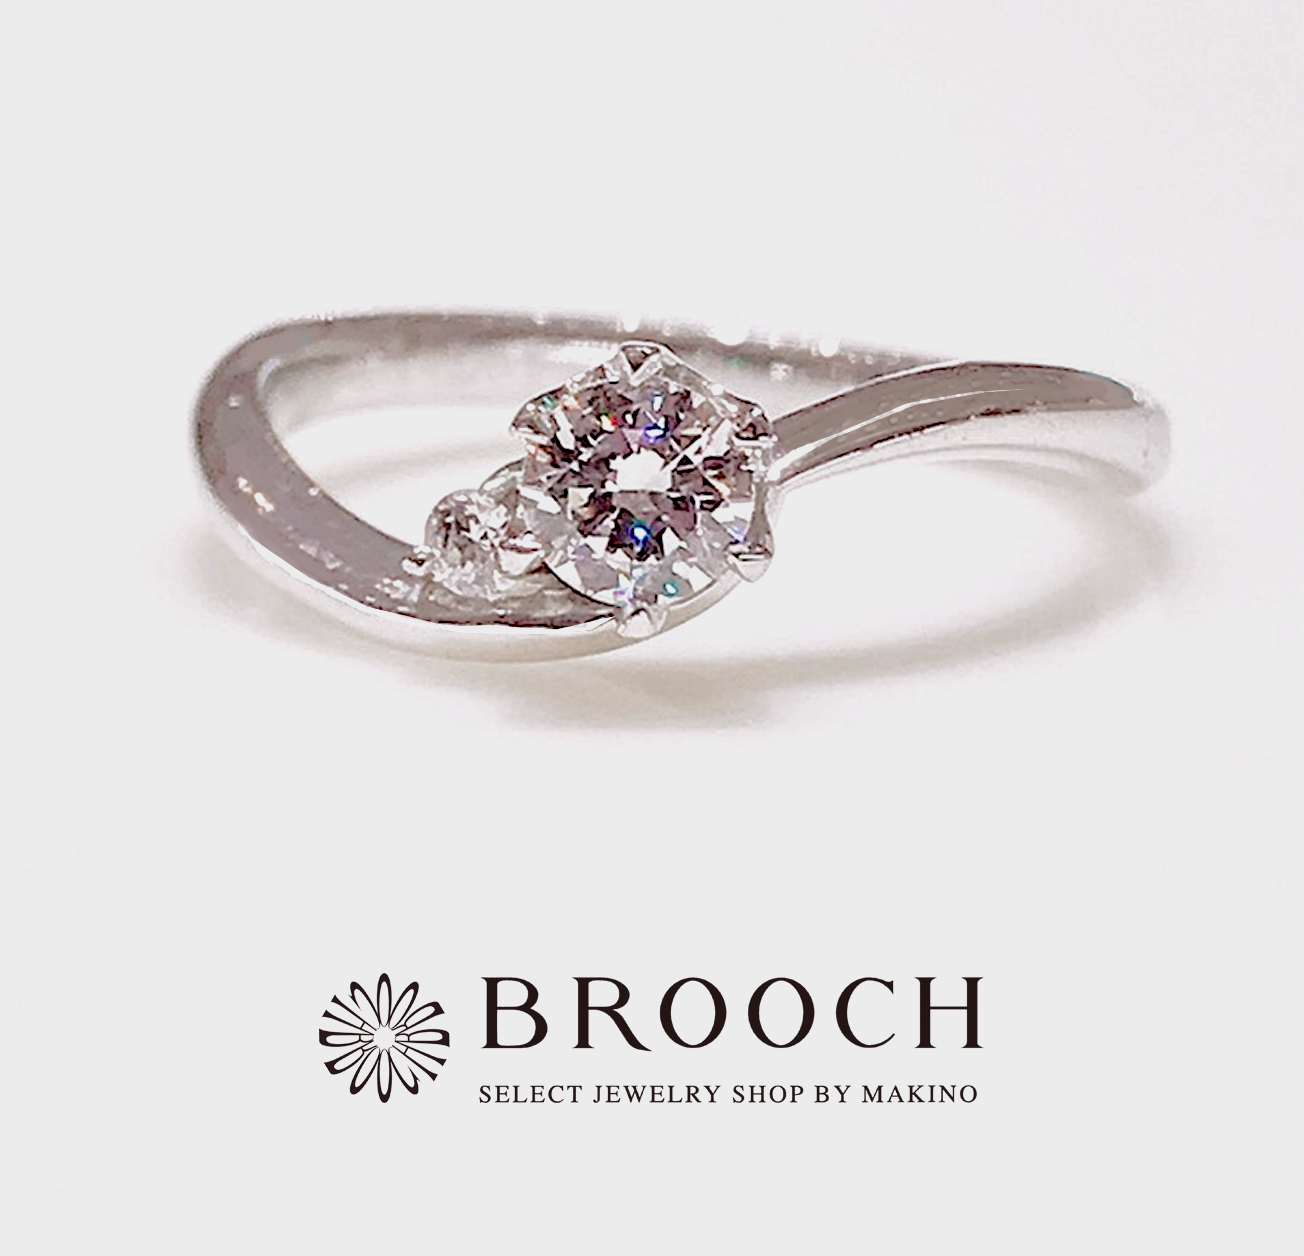 BROOCH 婚約指輪 エンゲージリング サイド1石ウエーブデザイン